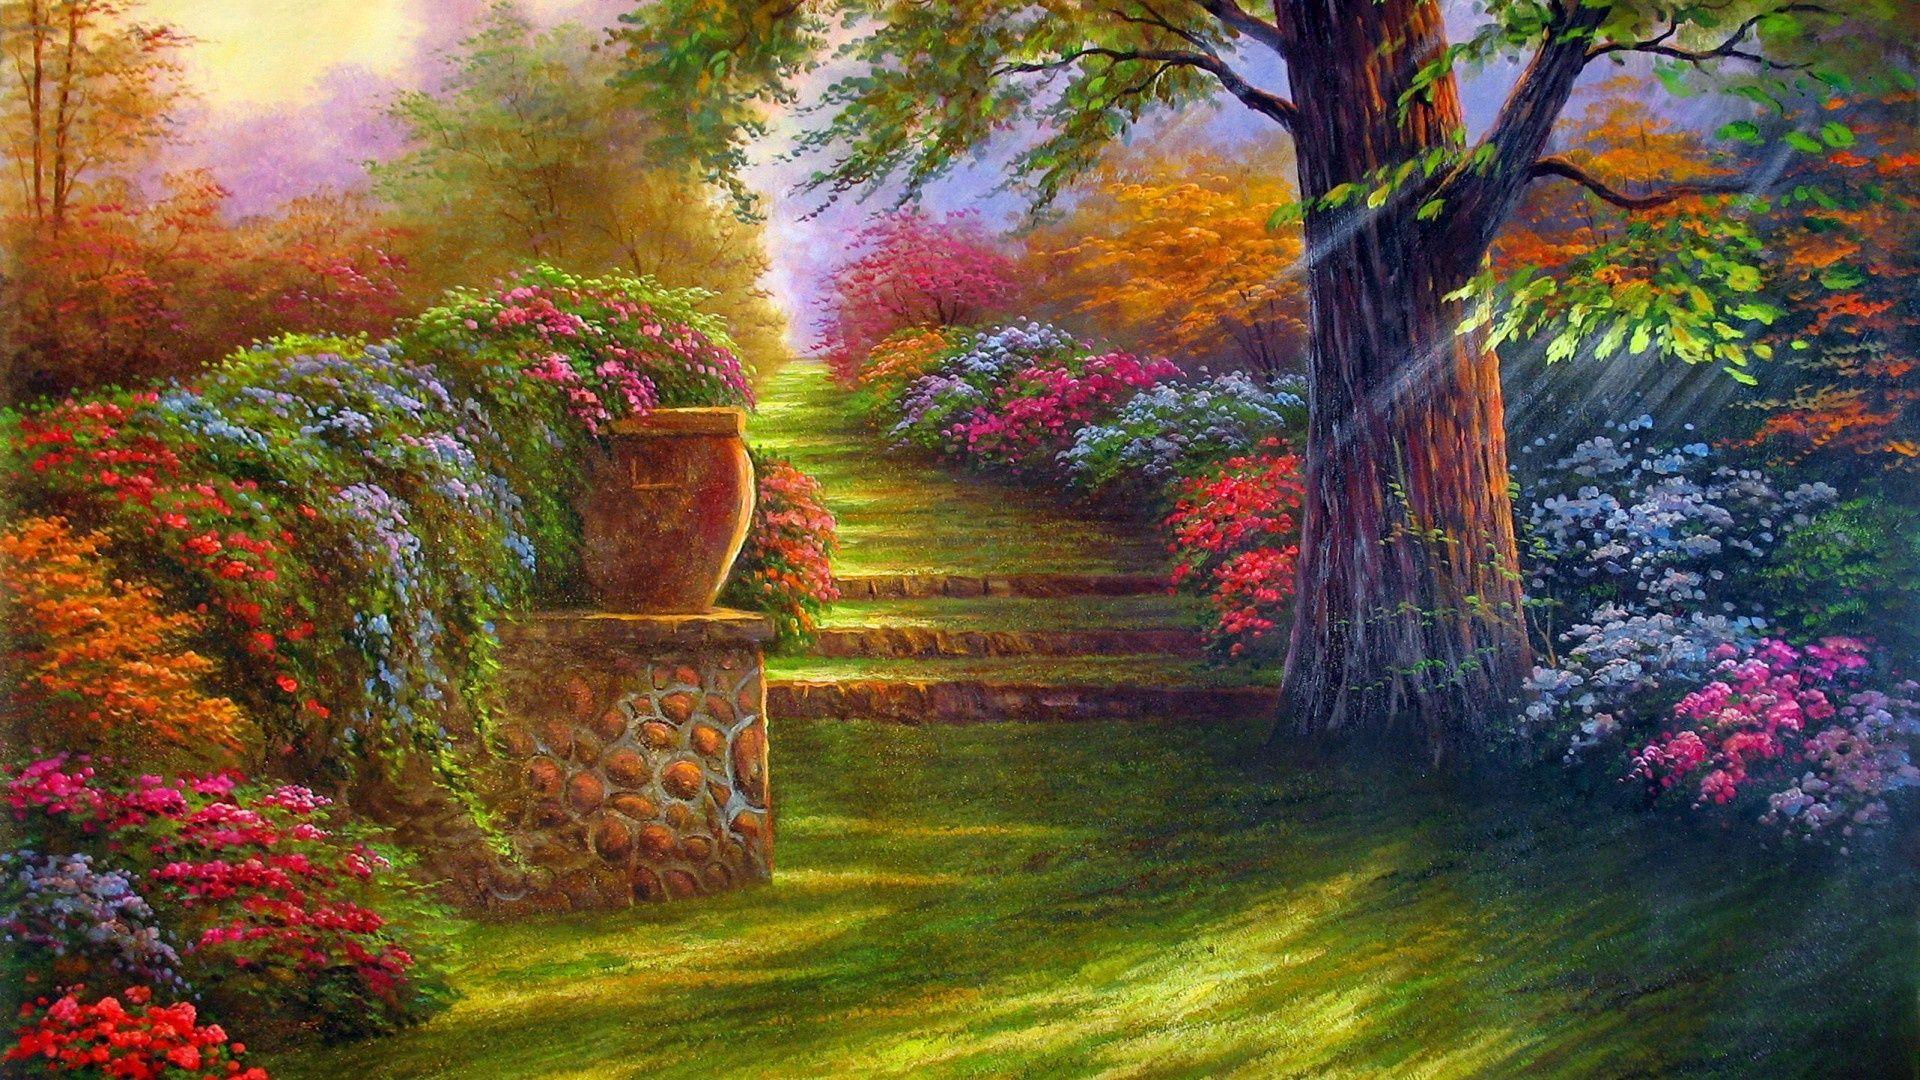 Flower Garden Wallpapers Find Best Latest Flower Garden Wallpapers In Hd For Your Pc Desktop Background Mobile Phones